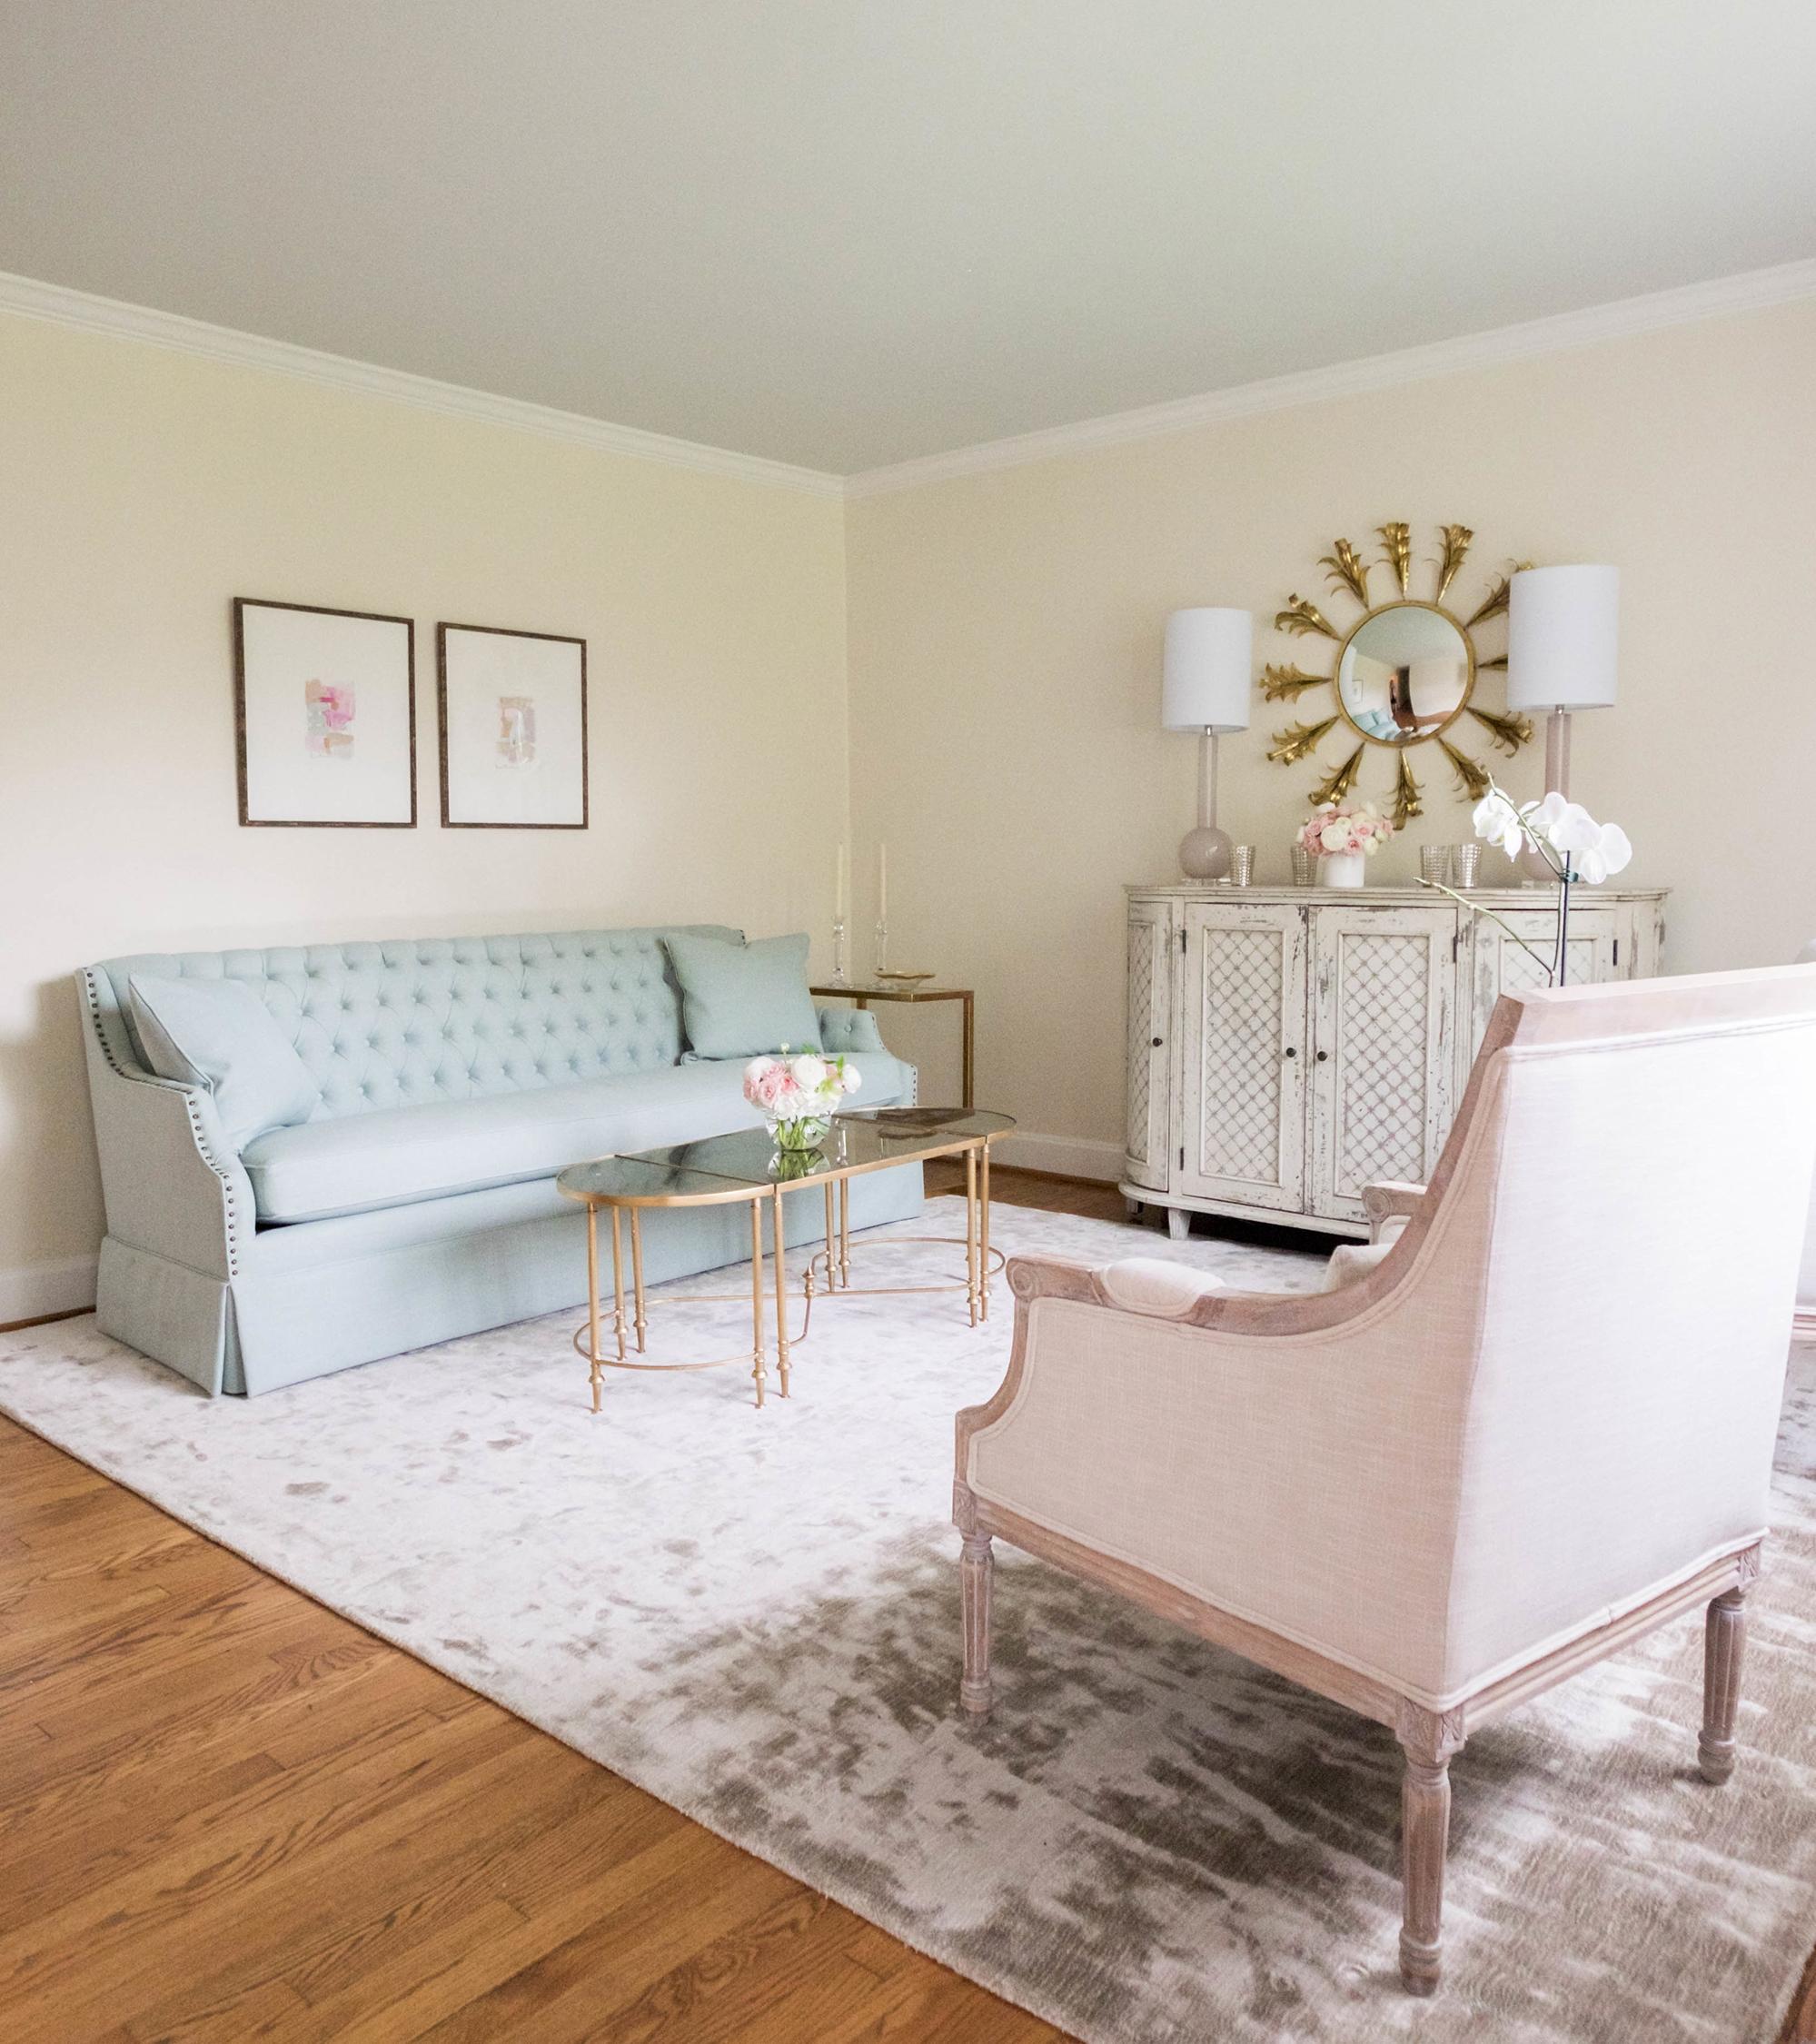 Alexander-Interiors-Nashville-Design-residential-home-spaces.jpg